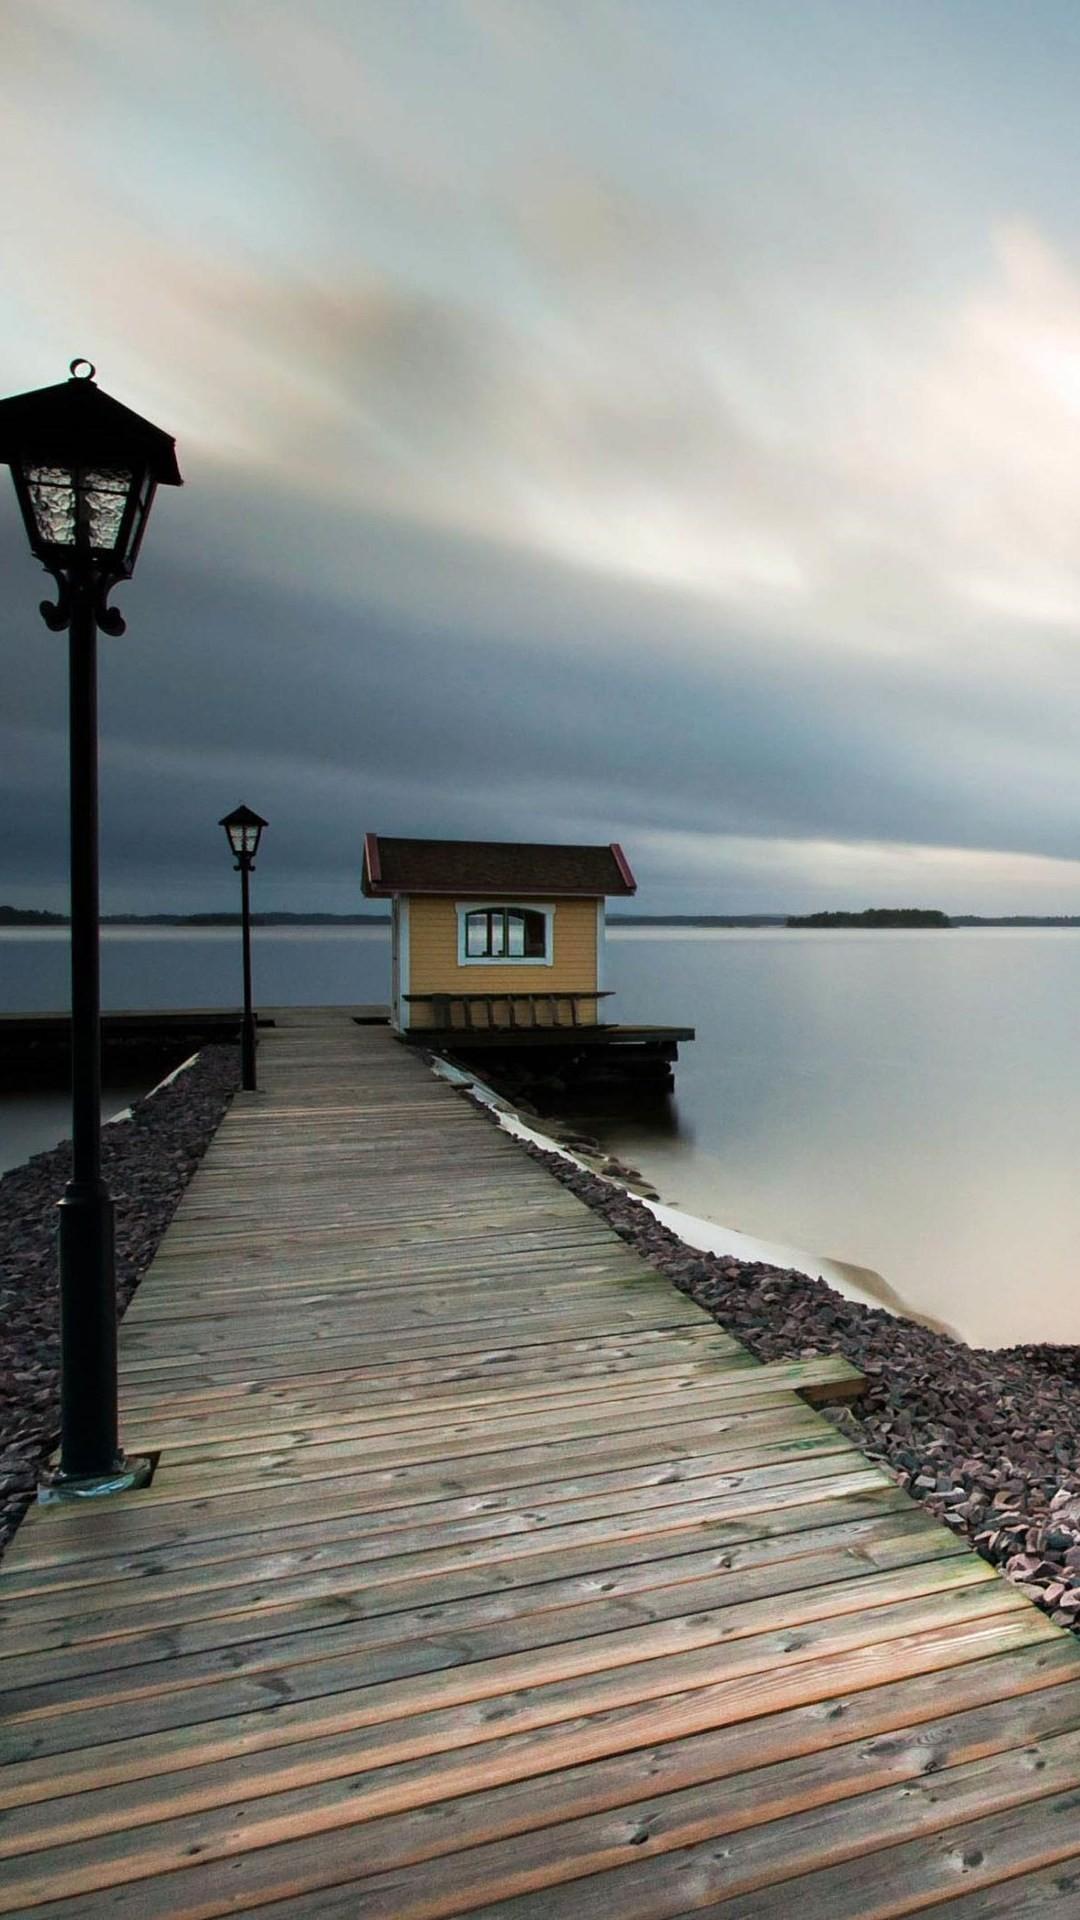 Best Amoled Wallpapers Iphone X Boat Port Wallpaper 1080x1920